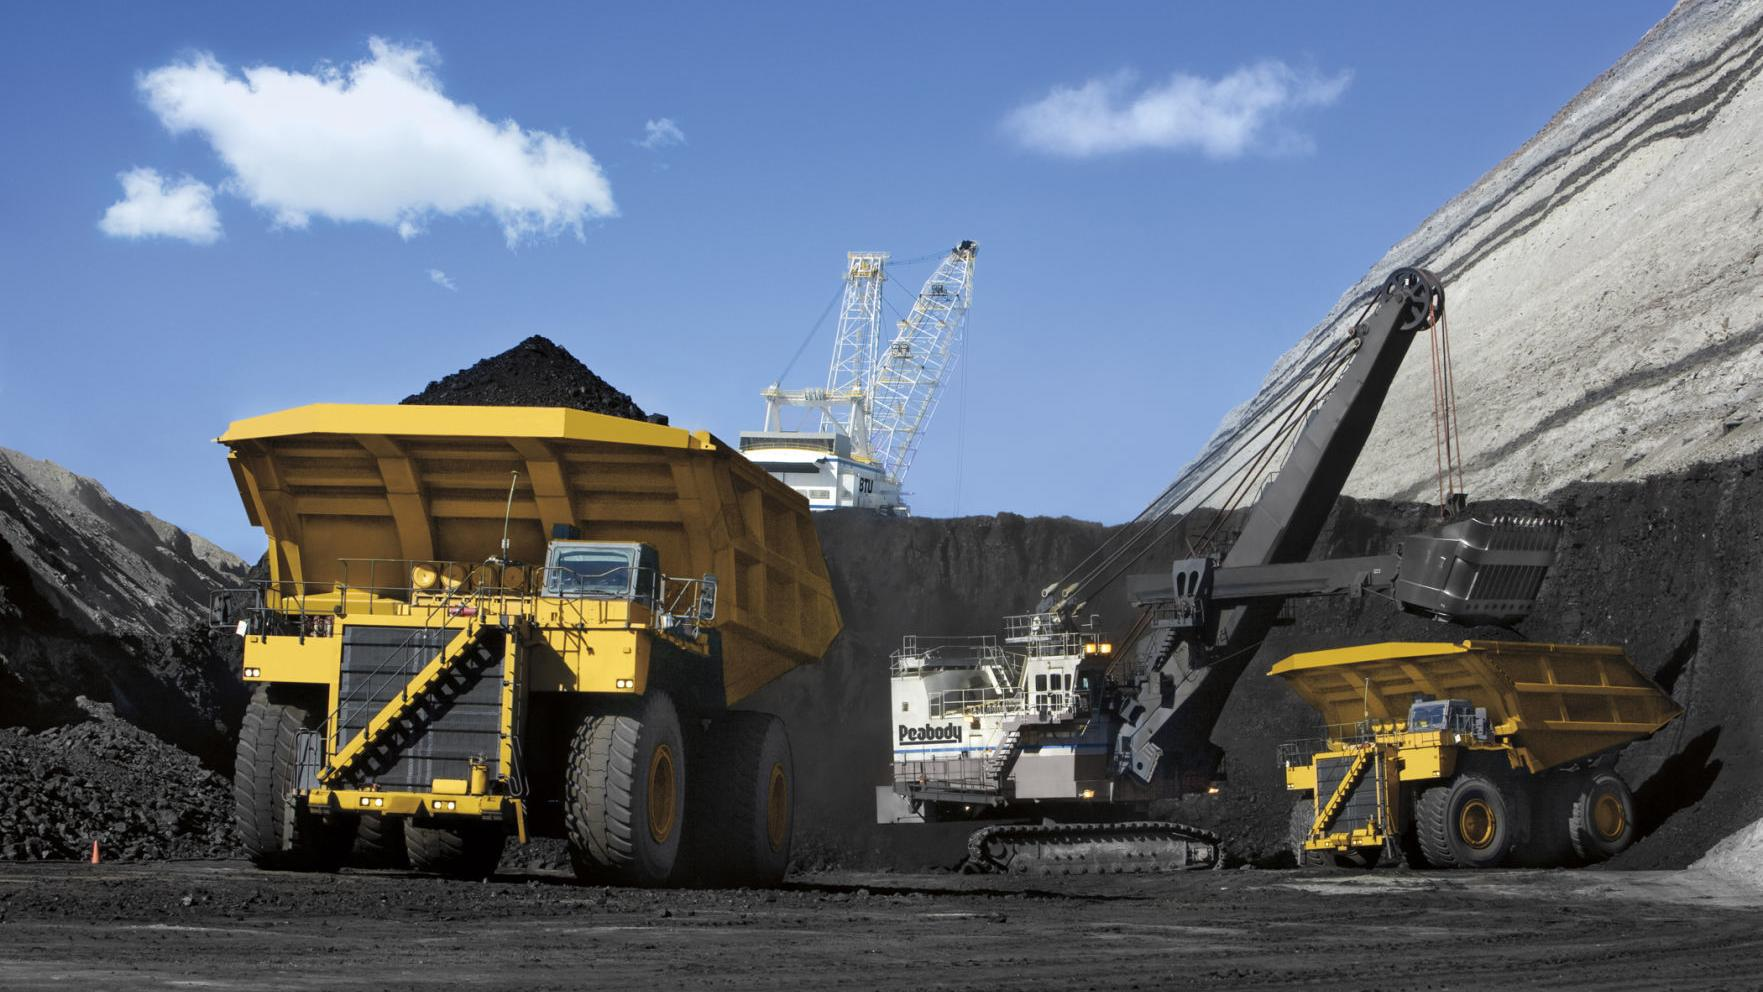 Wyoming fossil fuel companies kick off earnings season following tumultuous year